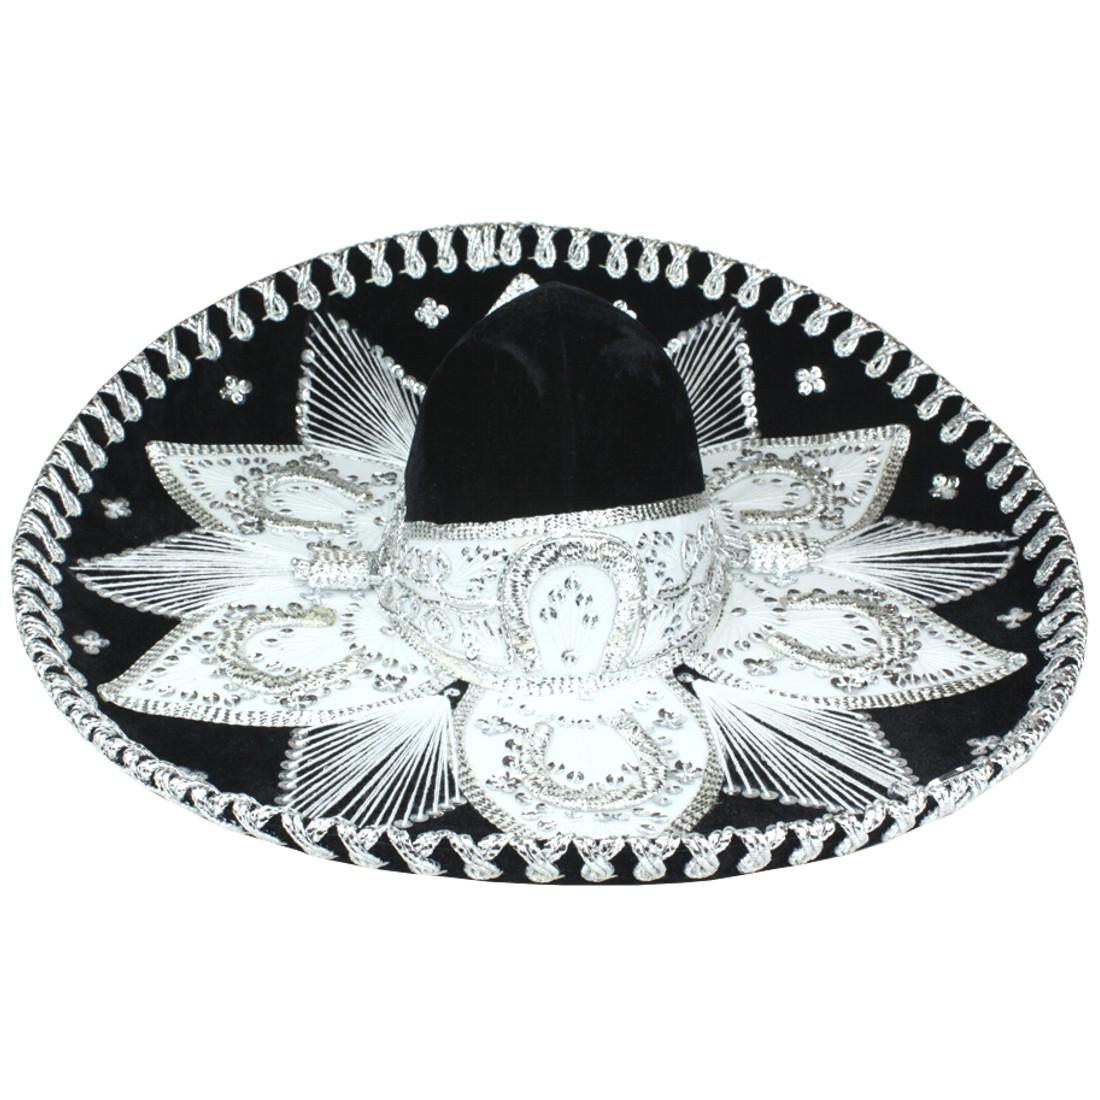 8230. Sombrero genuino de charro mexicano.  0103de585b9